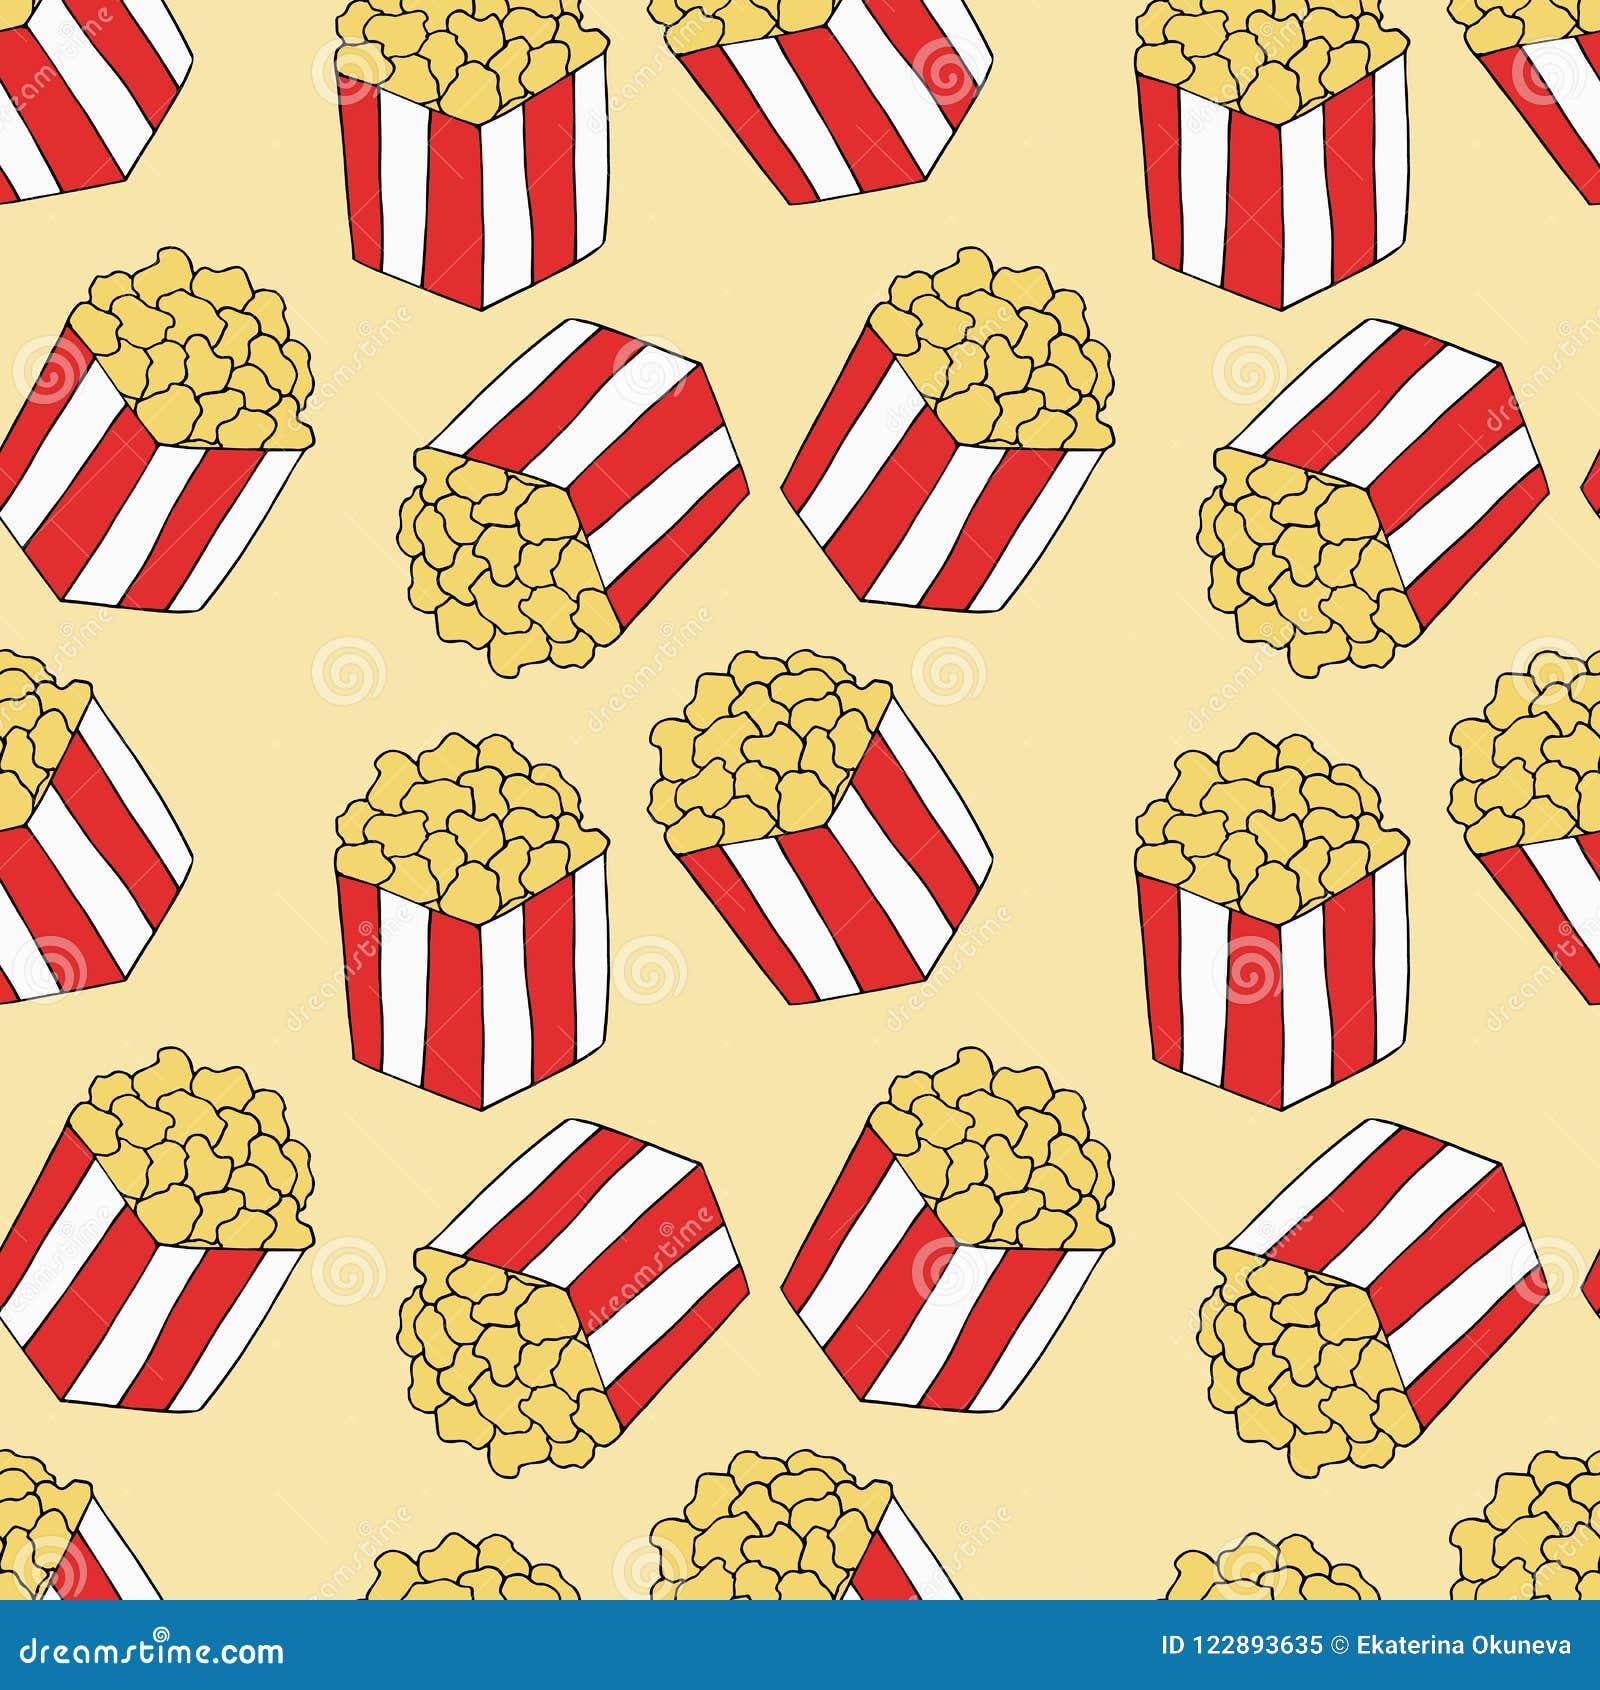 Popcorn Pattern Hand Drawn Illustration Bright Cartoon